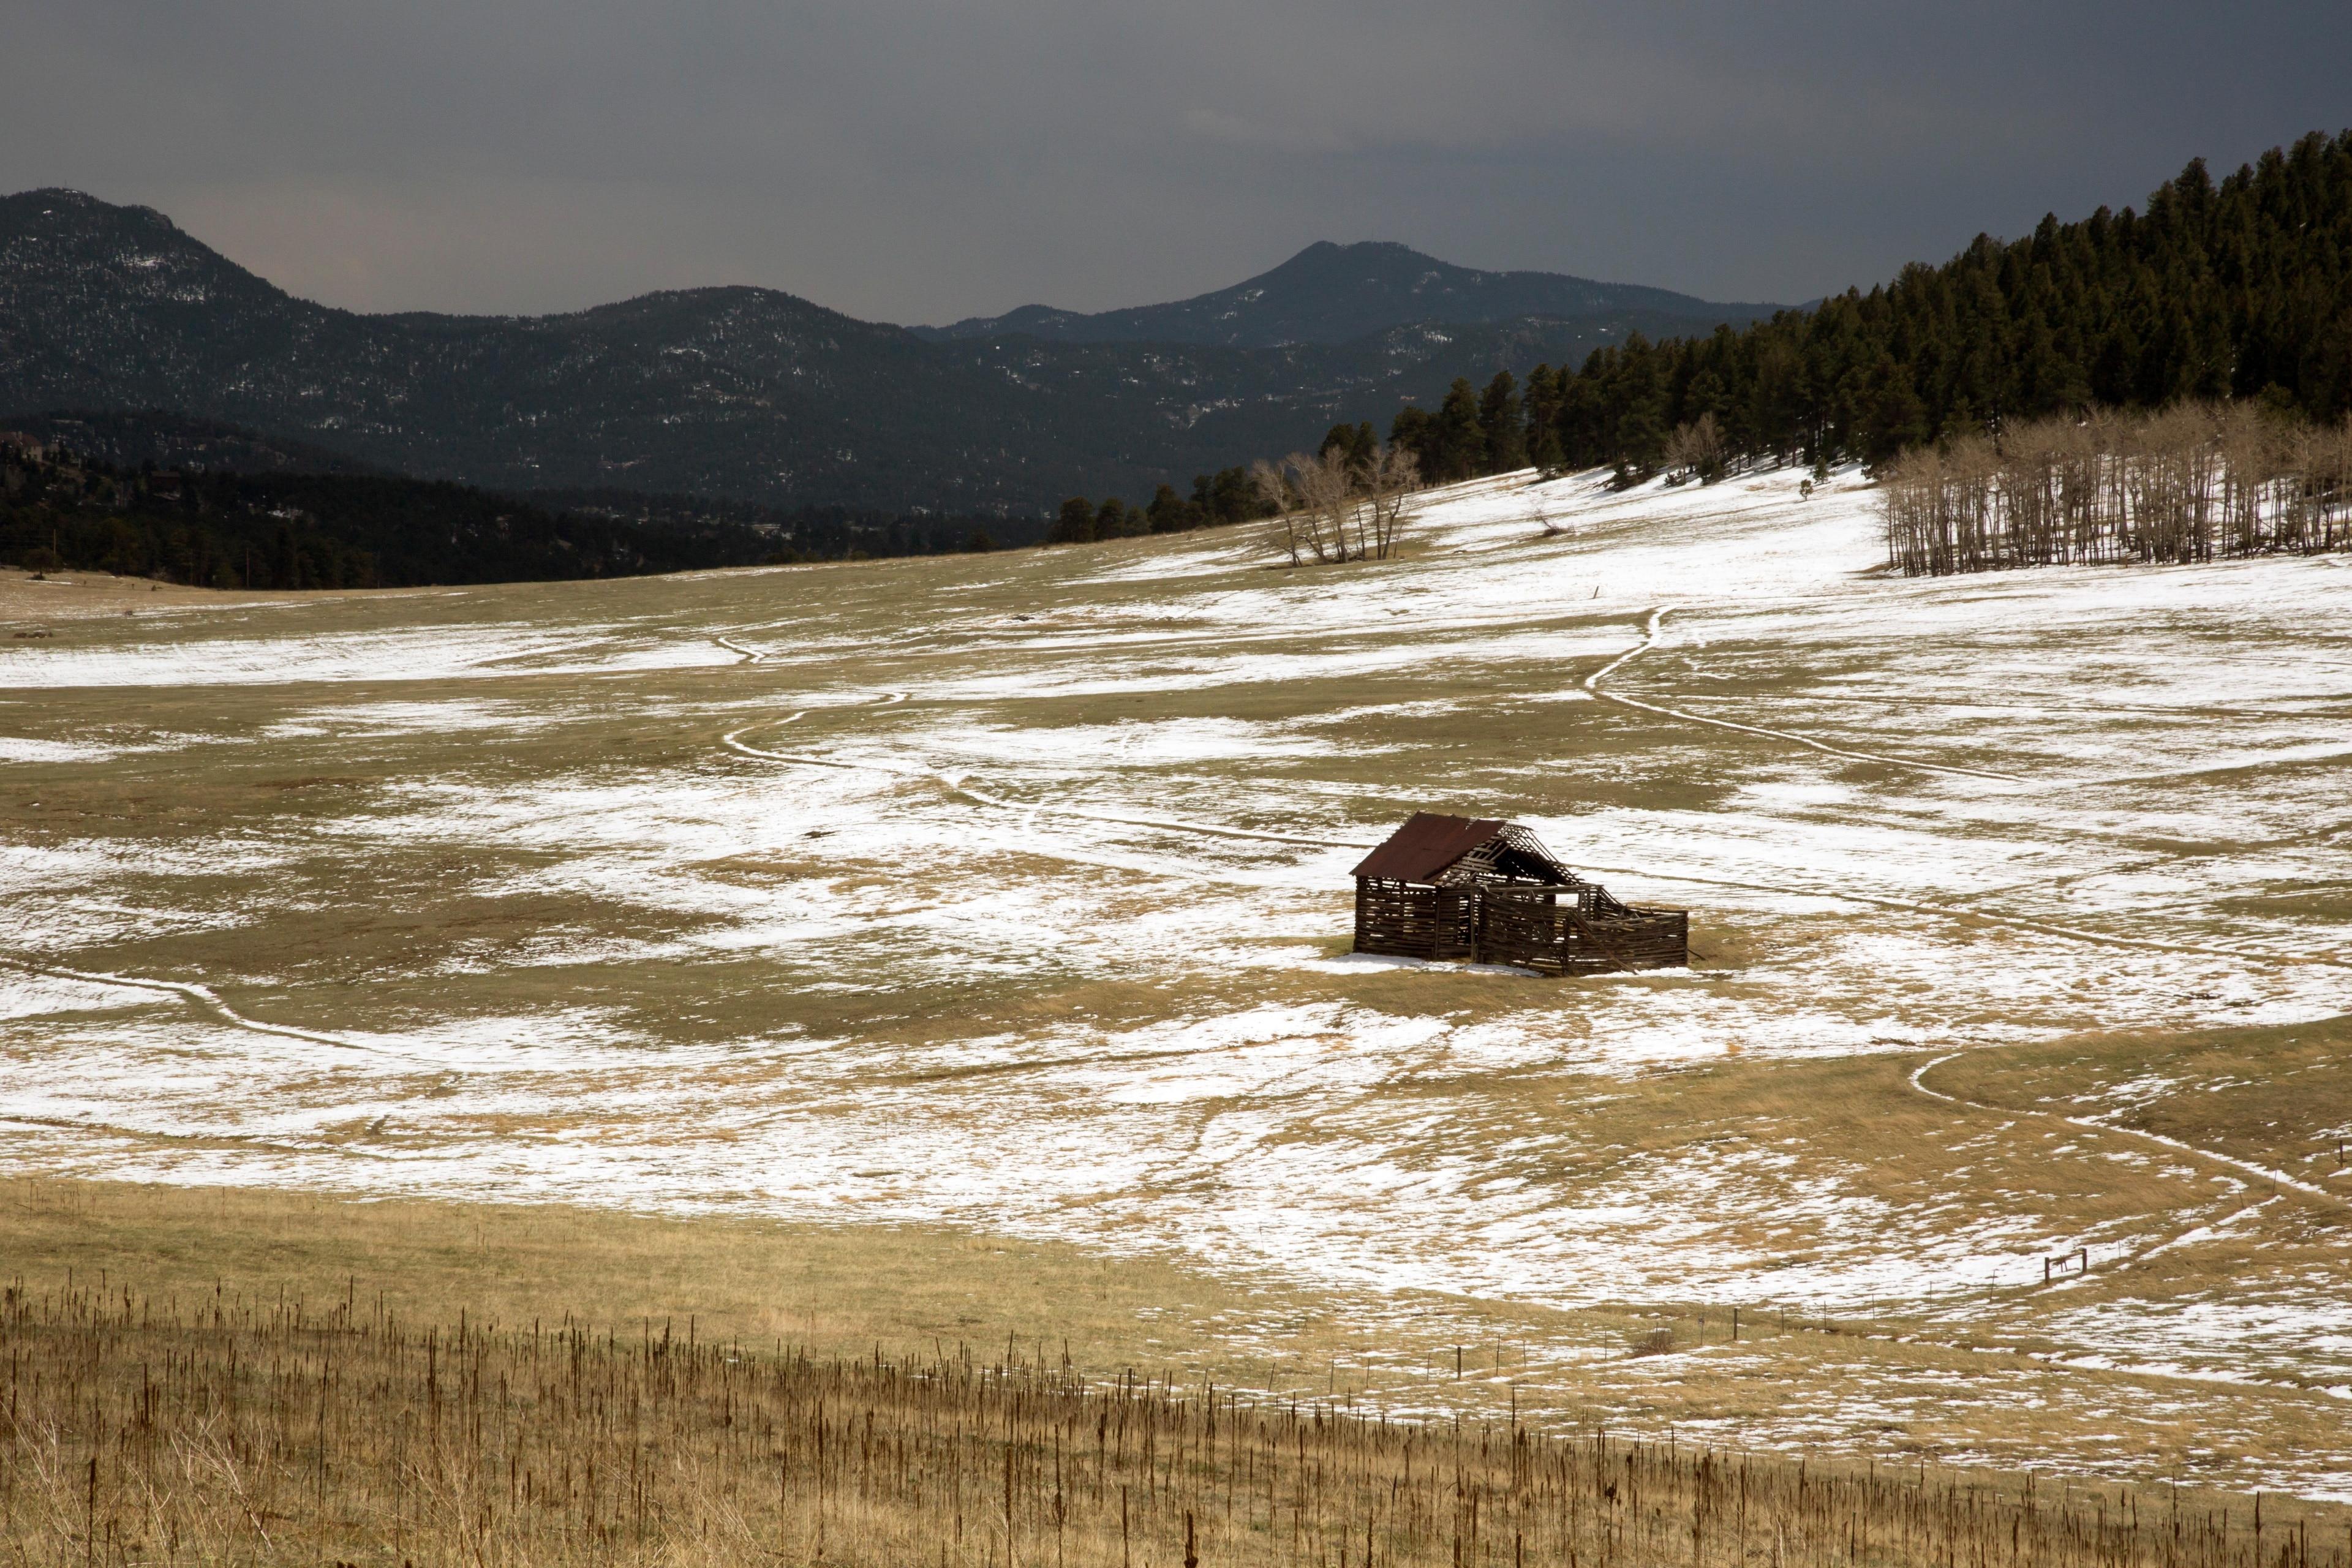 Evergreen, Colorado, United States of America